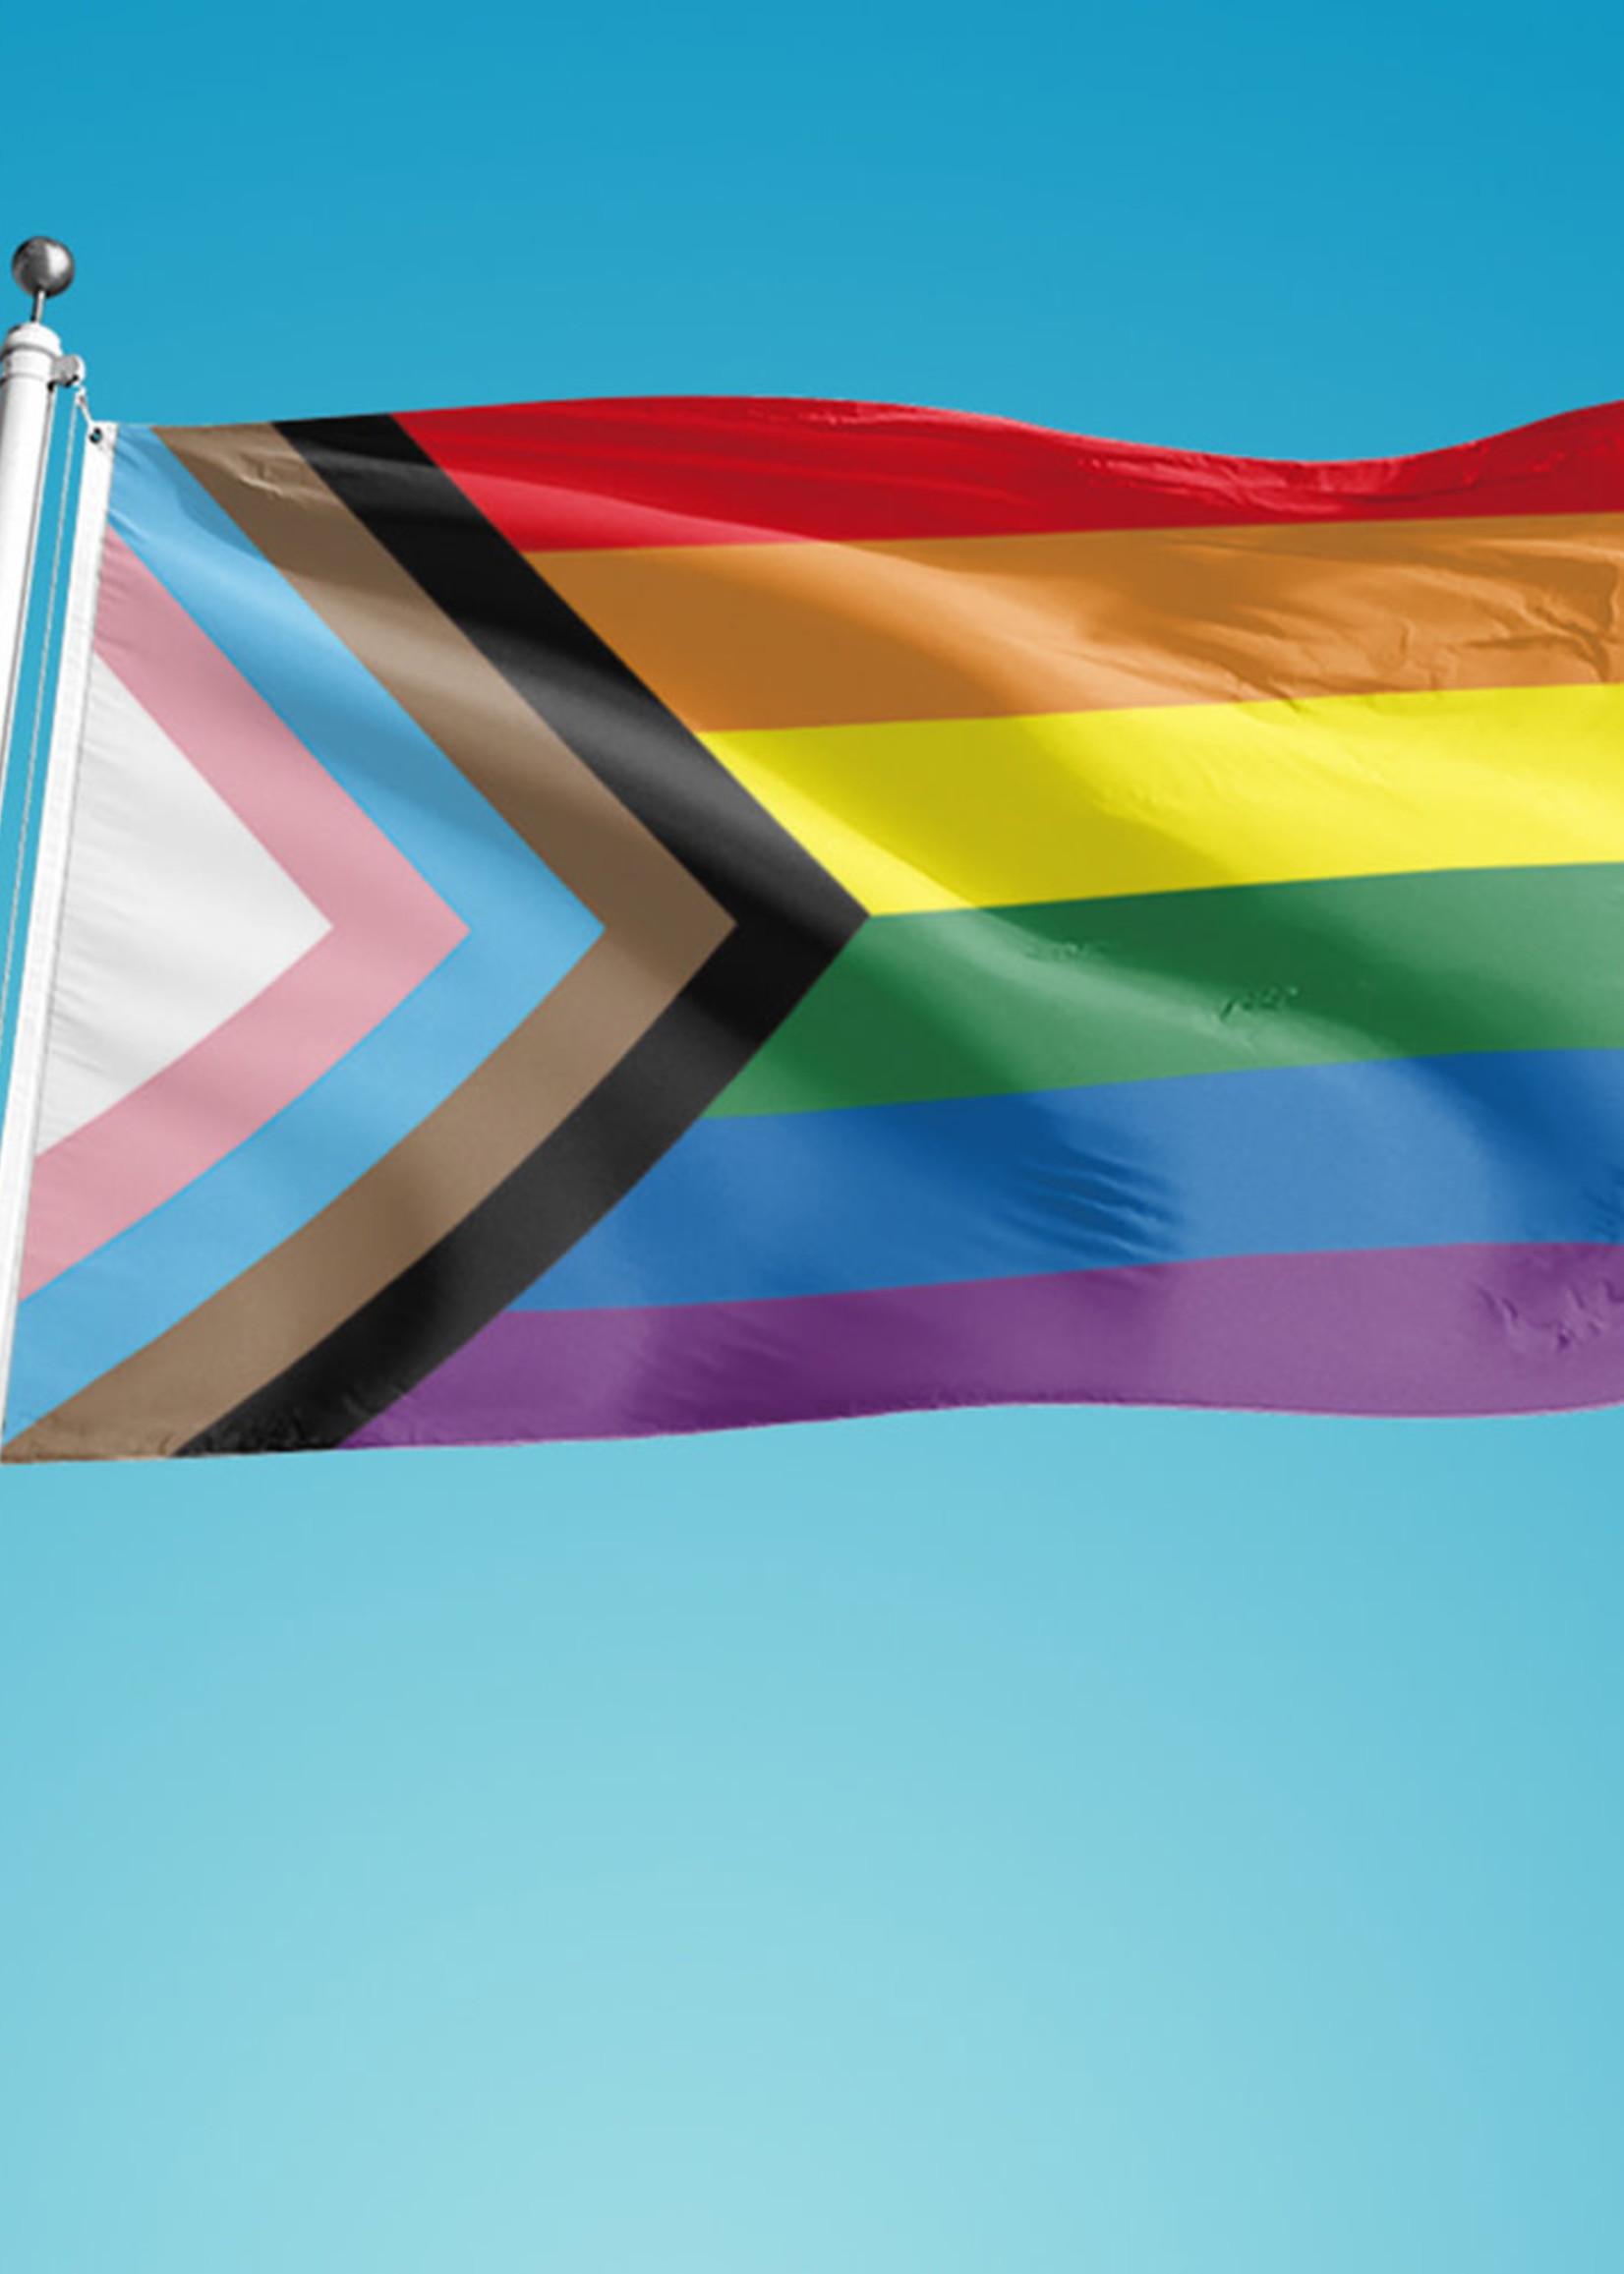 FLAGS IMPORTER FLAGS IMPORTER PROGRESSIVE 3X5 FLAG